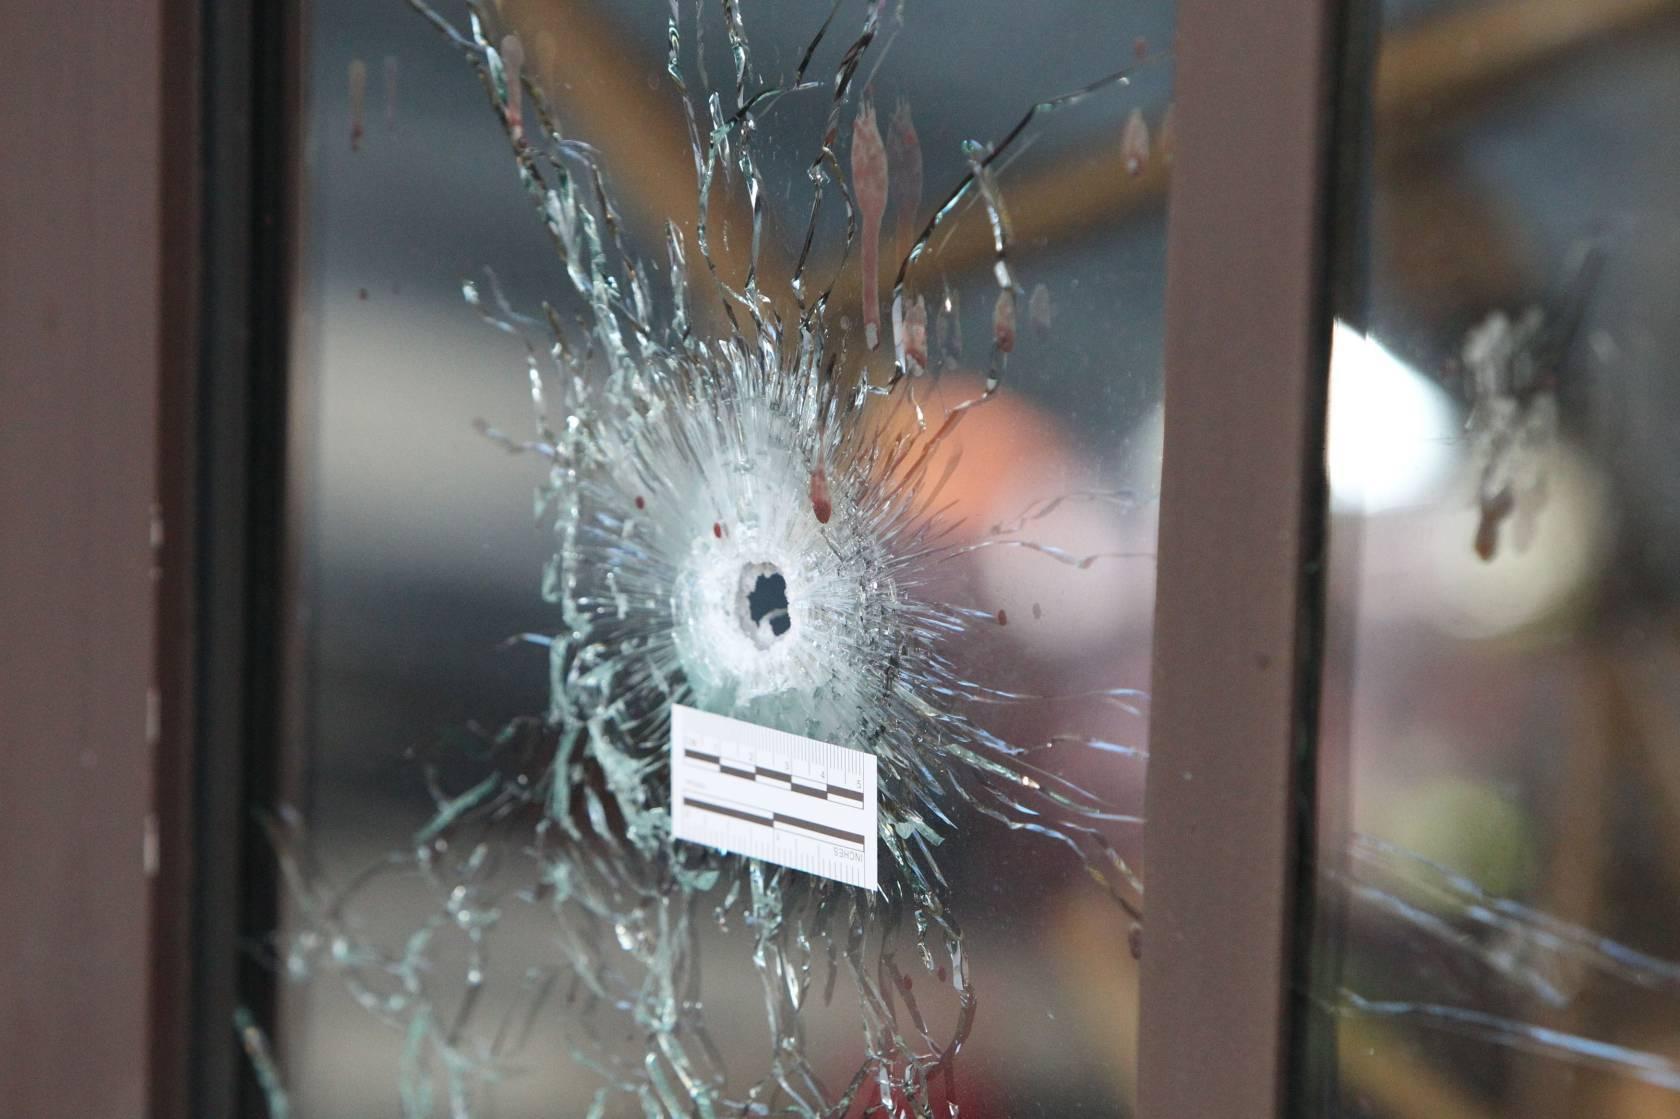 Bullet holes are visible in La Casa Nostra pizzeria.